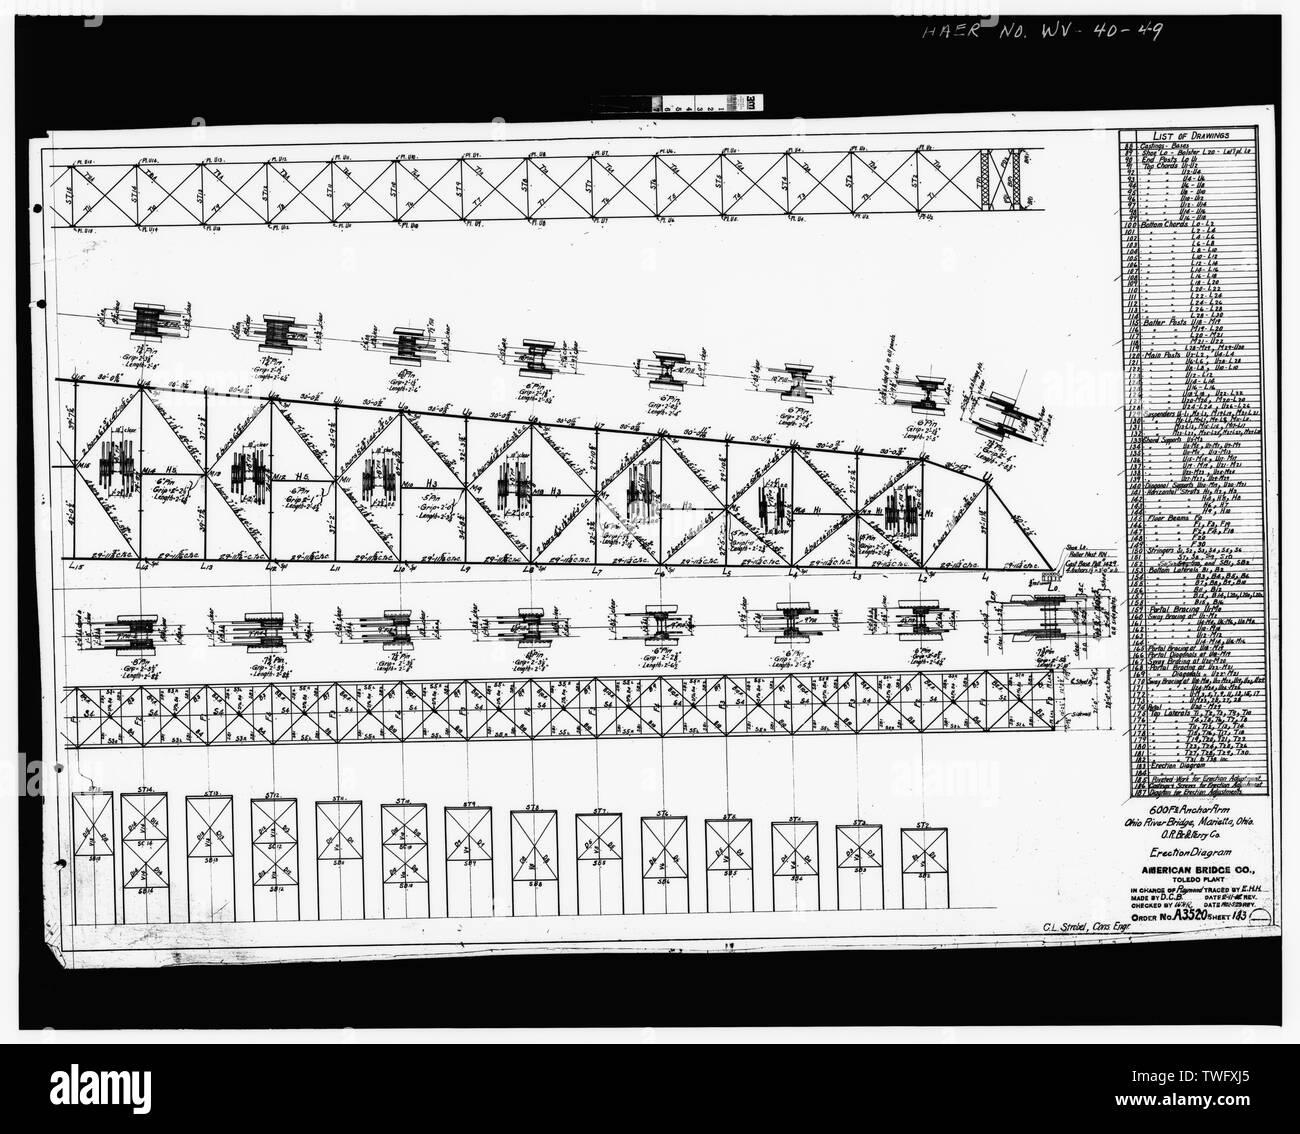 Plan Sheet -183 - Williamstown-Marietta Bridge, Spanning Ohio River between Williamstown and Marietta, Williamstown, Wood County, WV; American Bridge Company; Strobel, Charles L; Ripley, T M - Stock Image